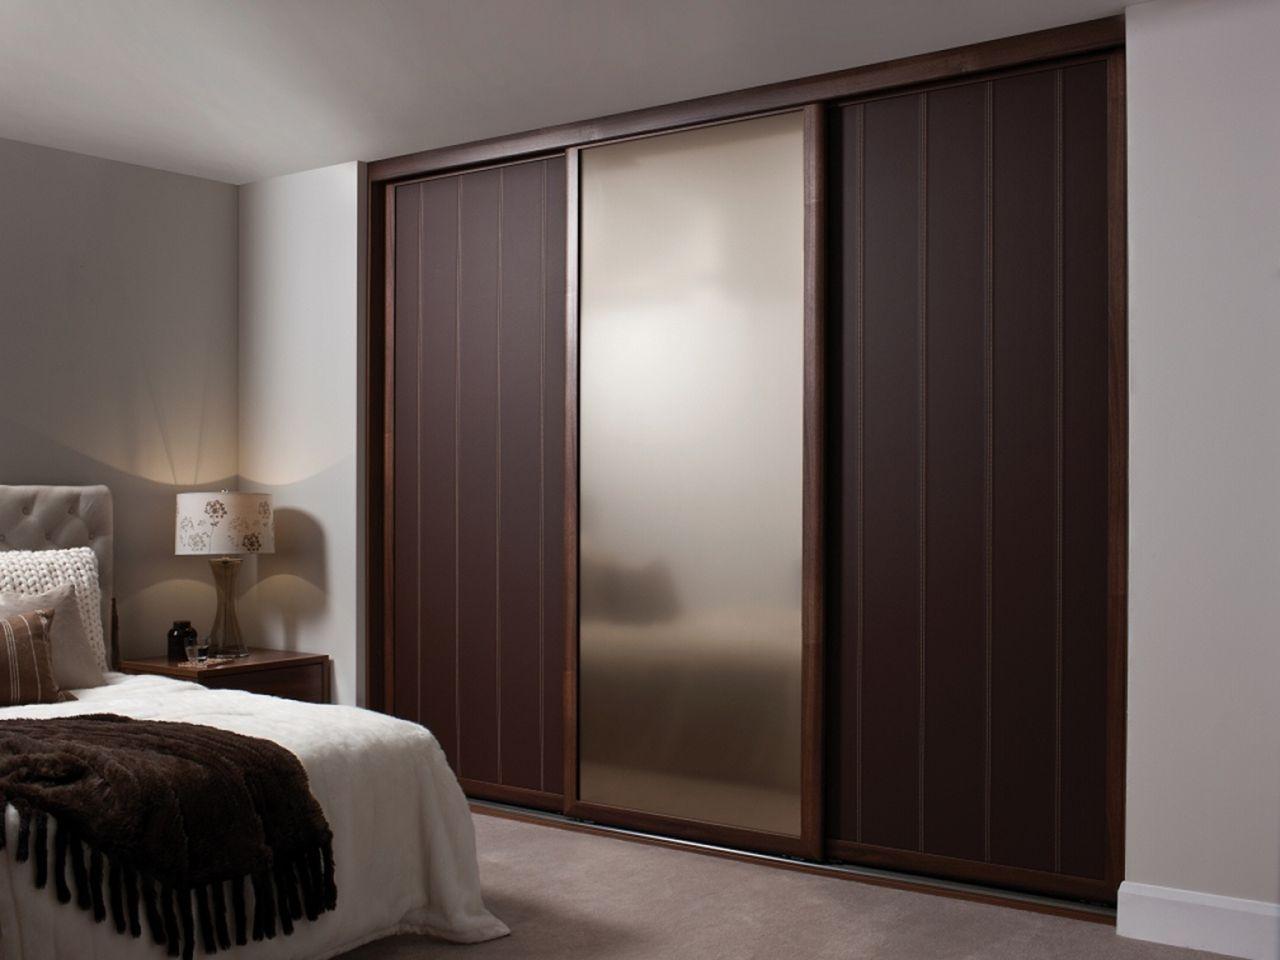 Mesh Platform Sneakers In 2020 Sliding Wardrobe Doors Wardrobe Door Designs Wardrobe Design Bedroom